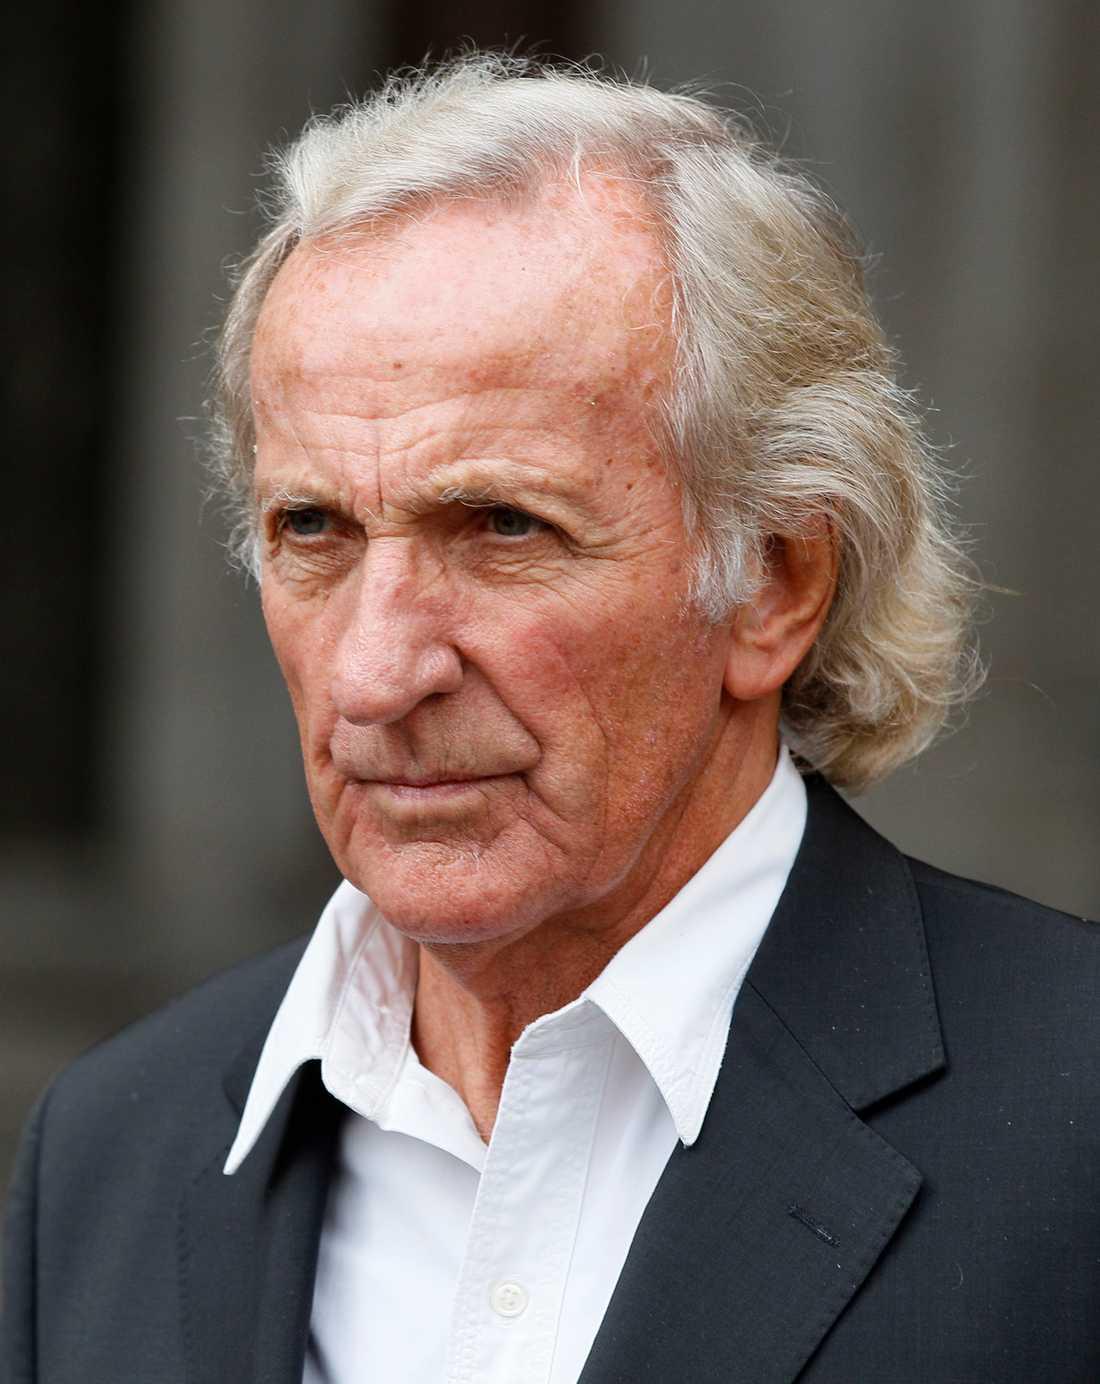 Australiensiske författaren John Pilger stödjer Julian Assange.